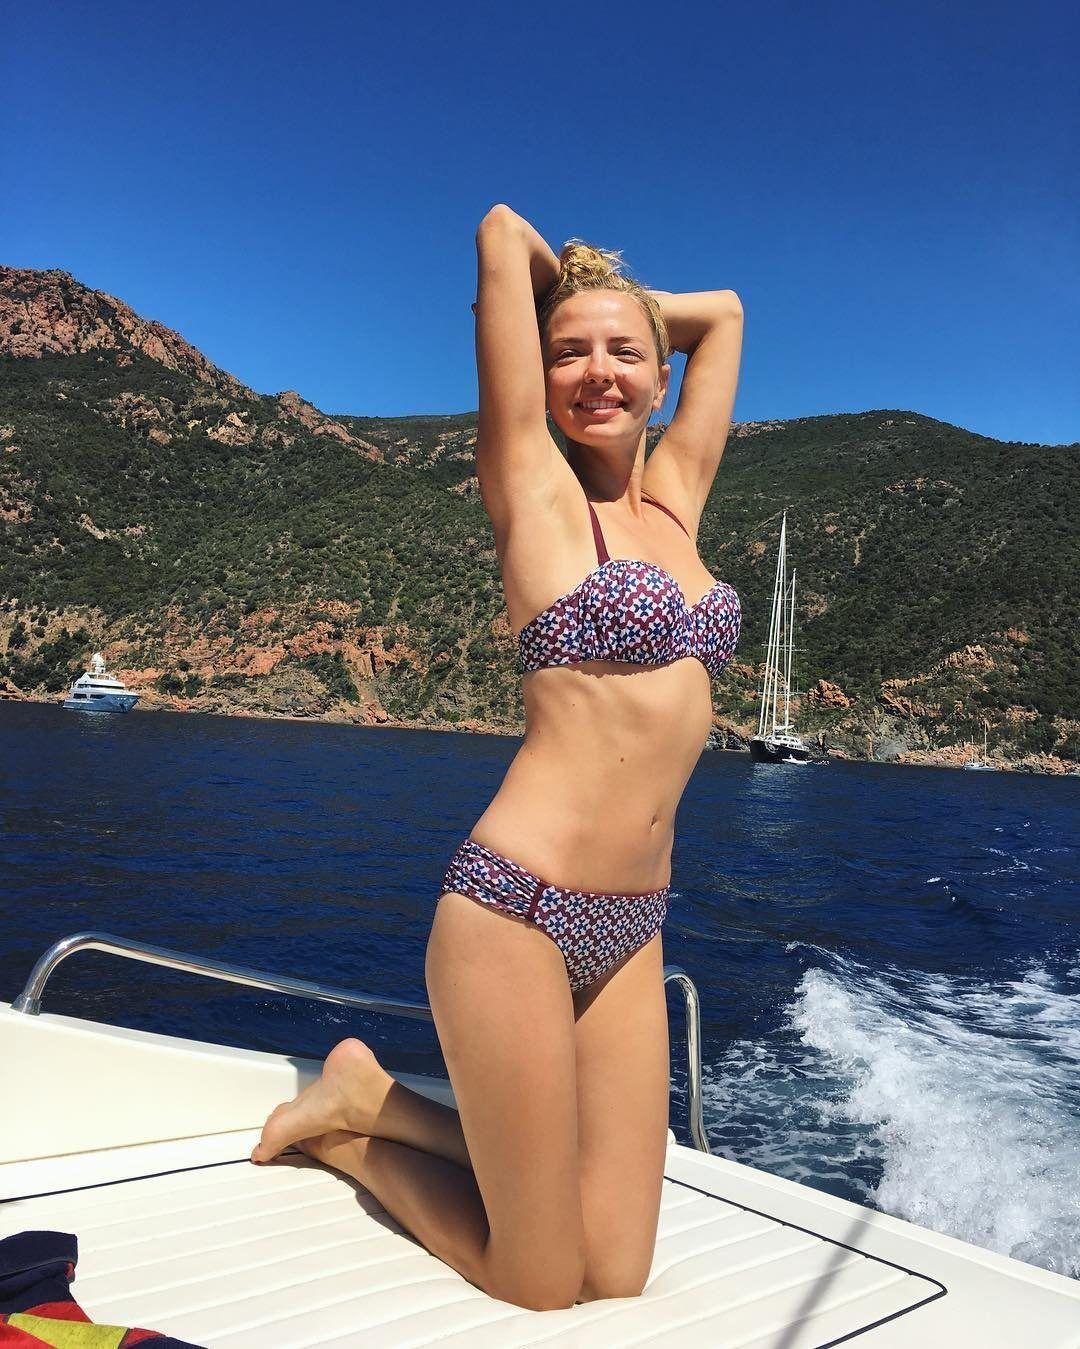 Bikini Marina Orlova nude photos 2019